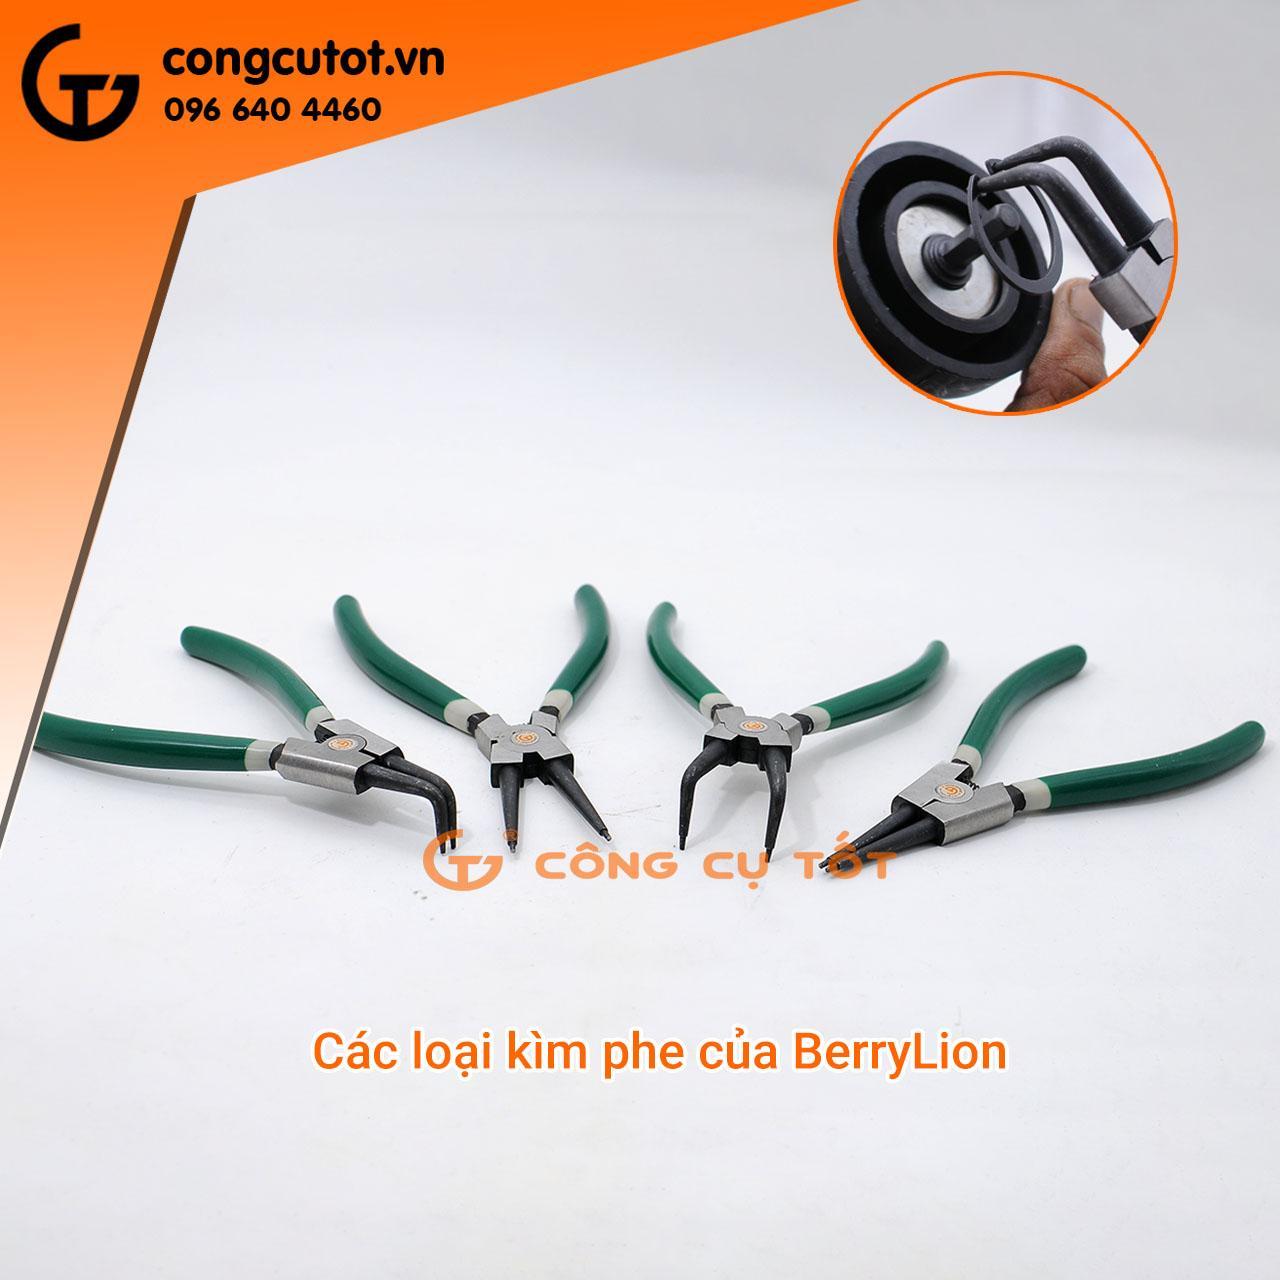 Combo 4 chiếc kìm mở phe Berrylion